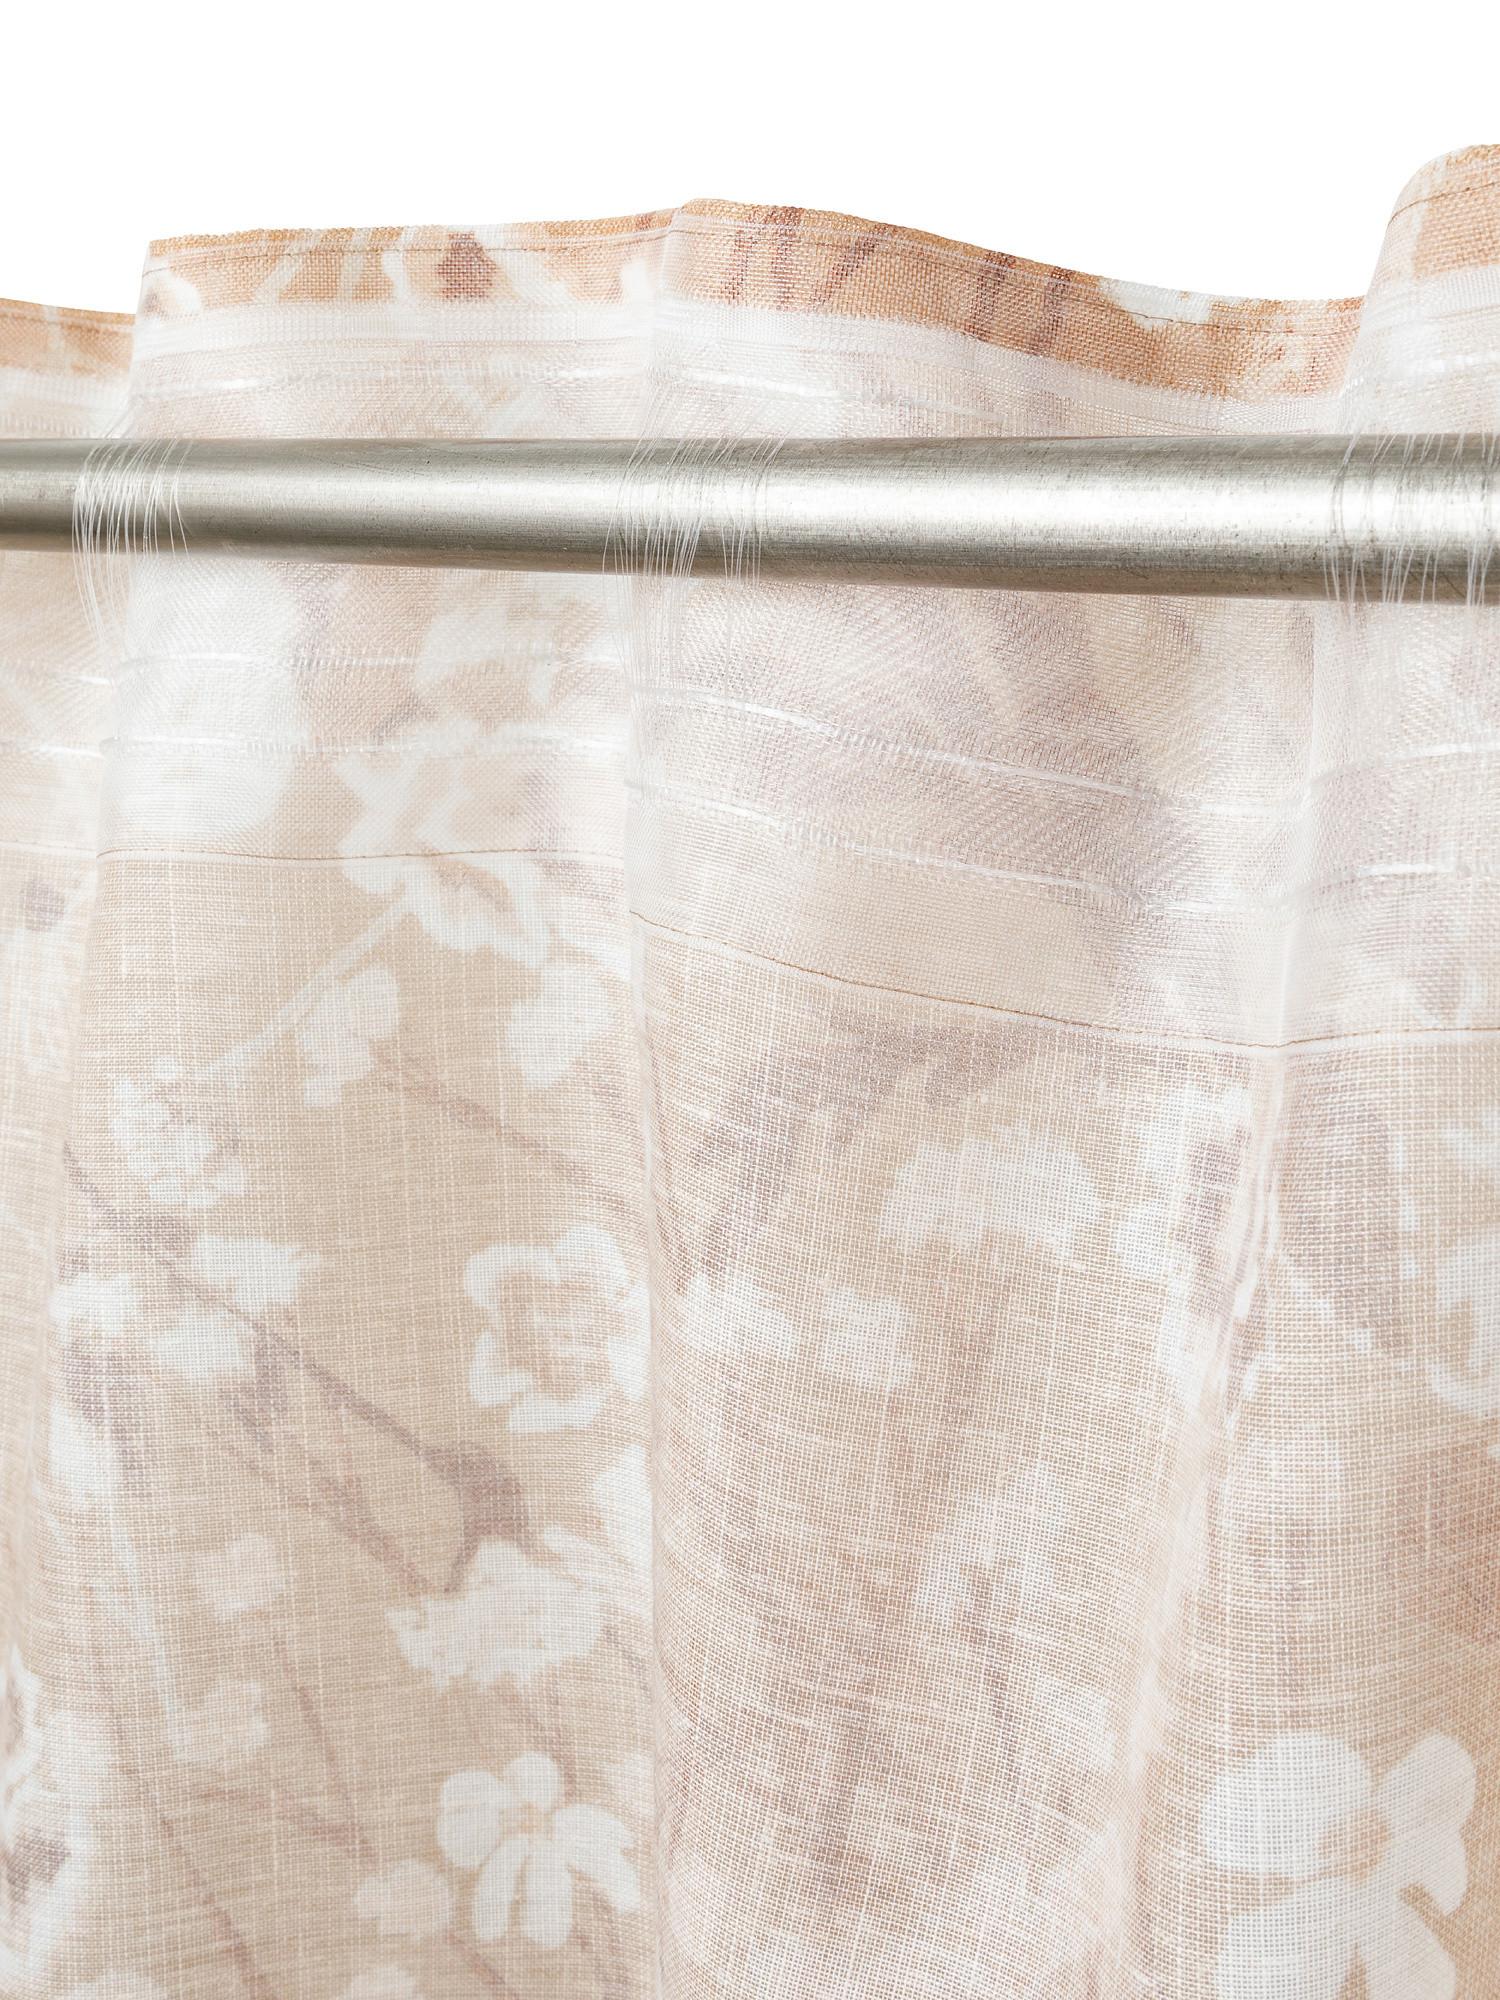 Tenda stampa floreale con passanti nascosti, Beige, large image number 3